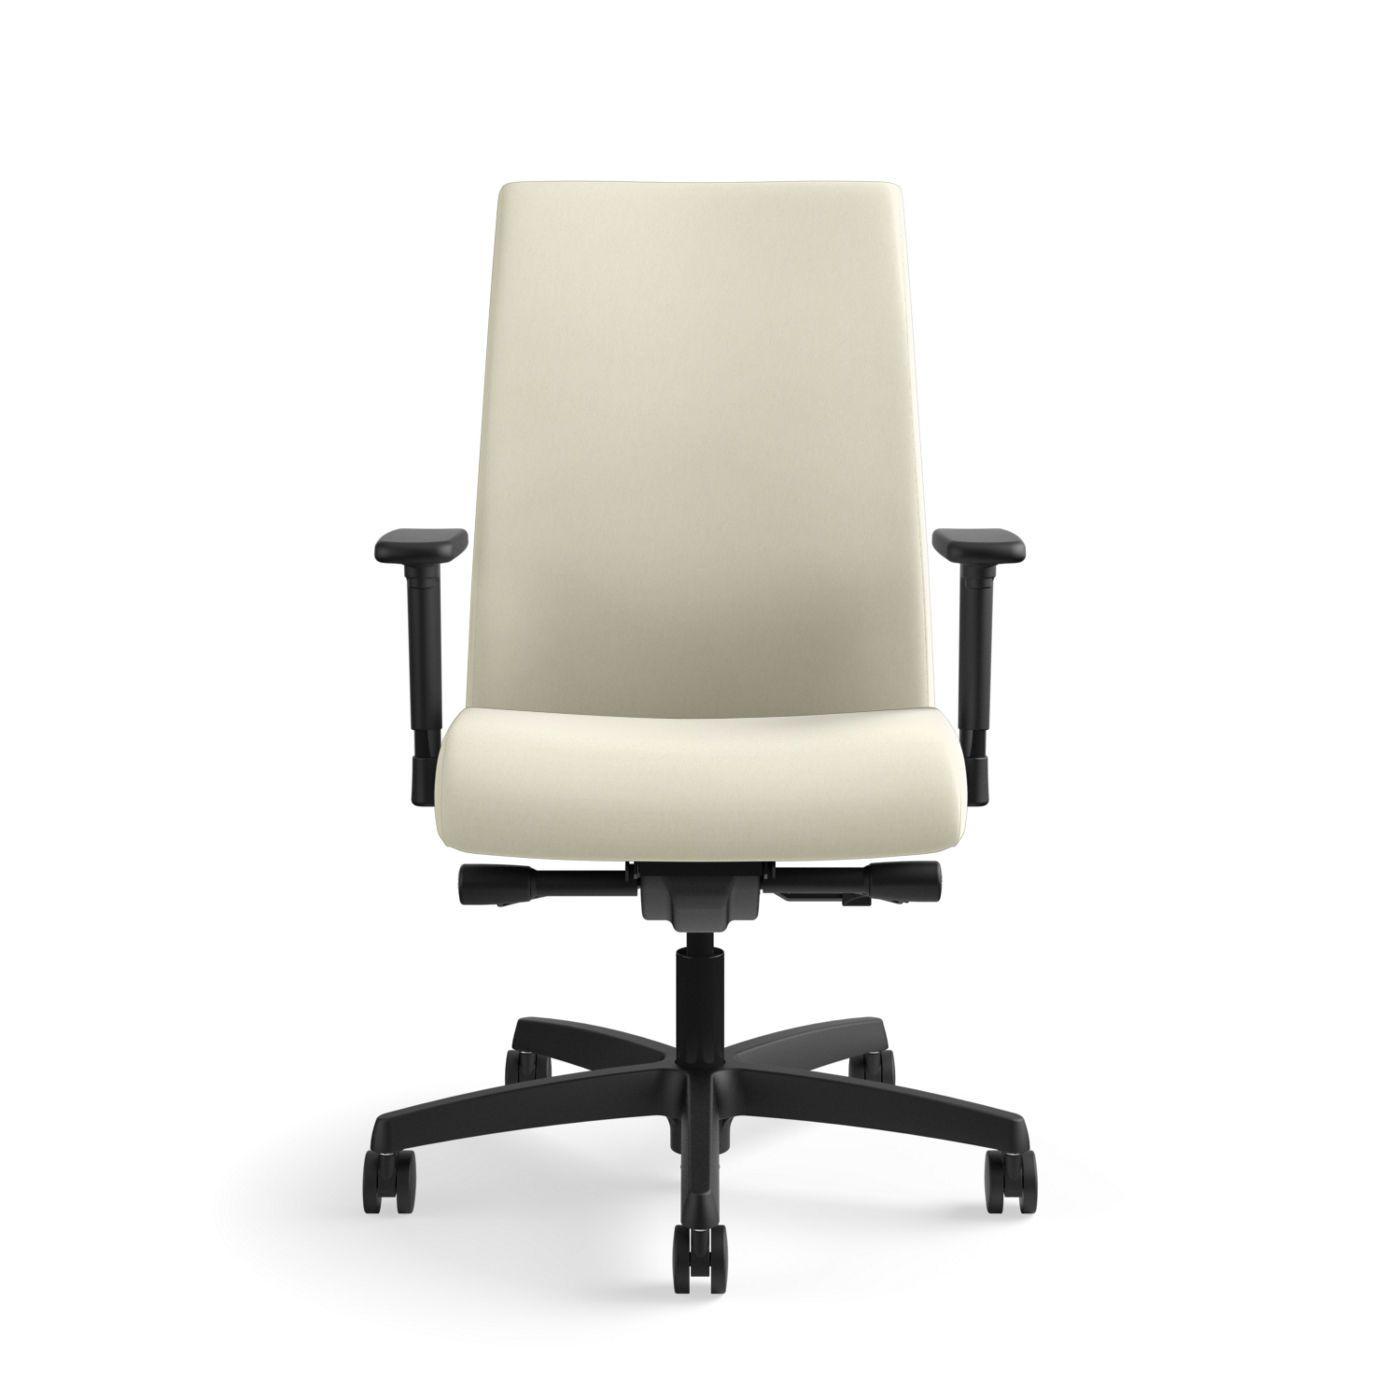 Lariat Alabaster Hon Office Furniture Hon Office Furniture